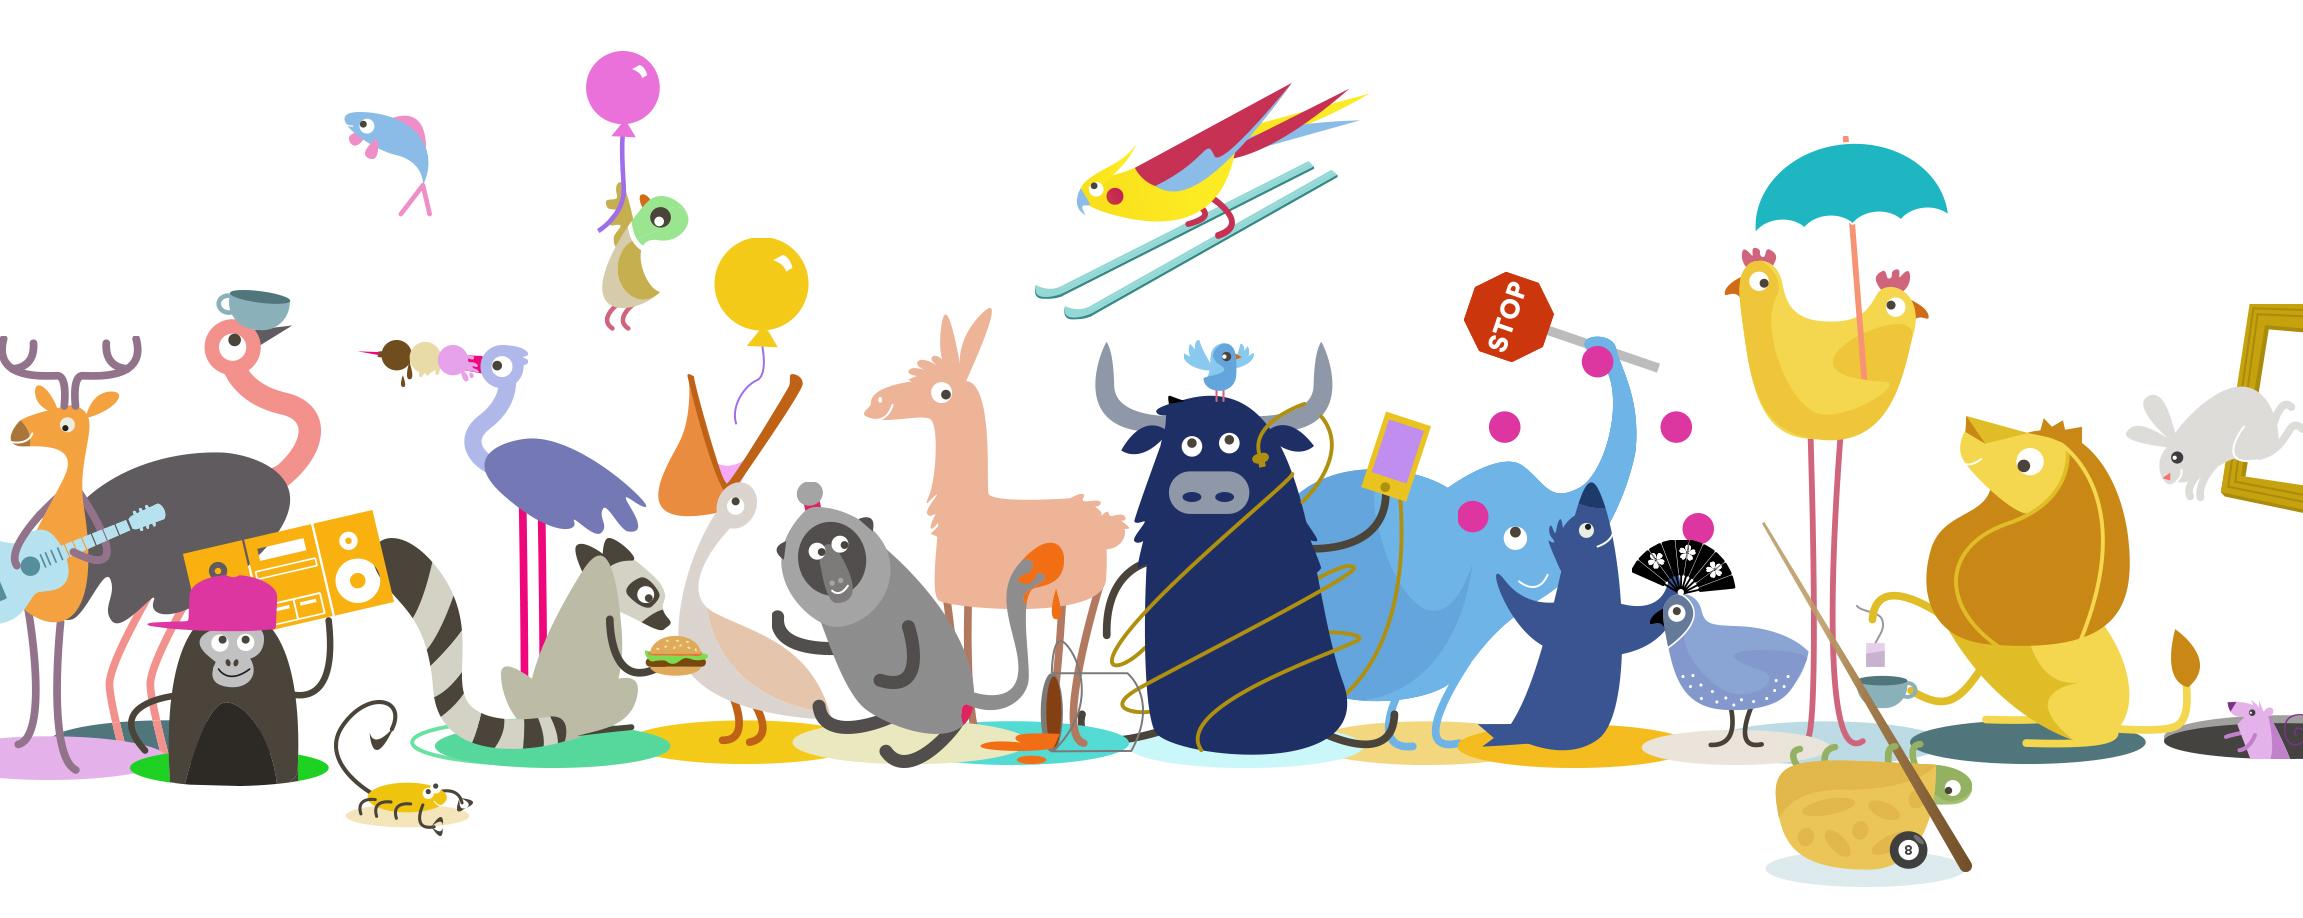 Rethink Animal Illustration Party